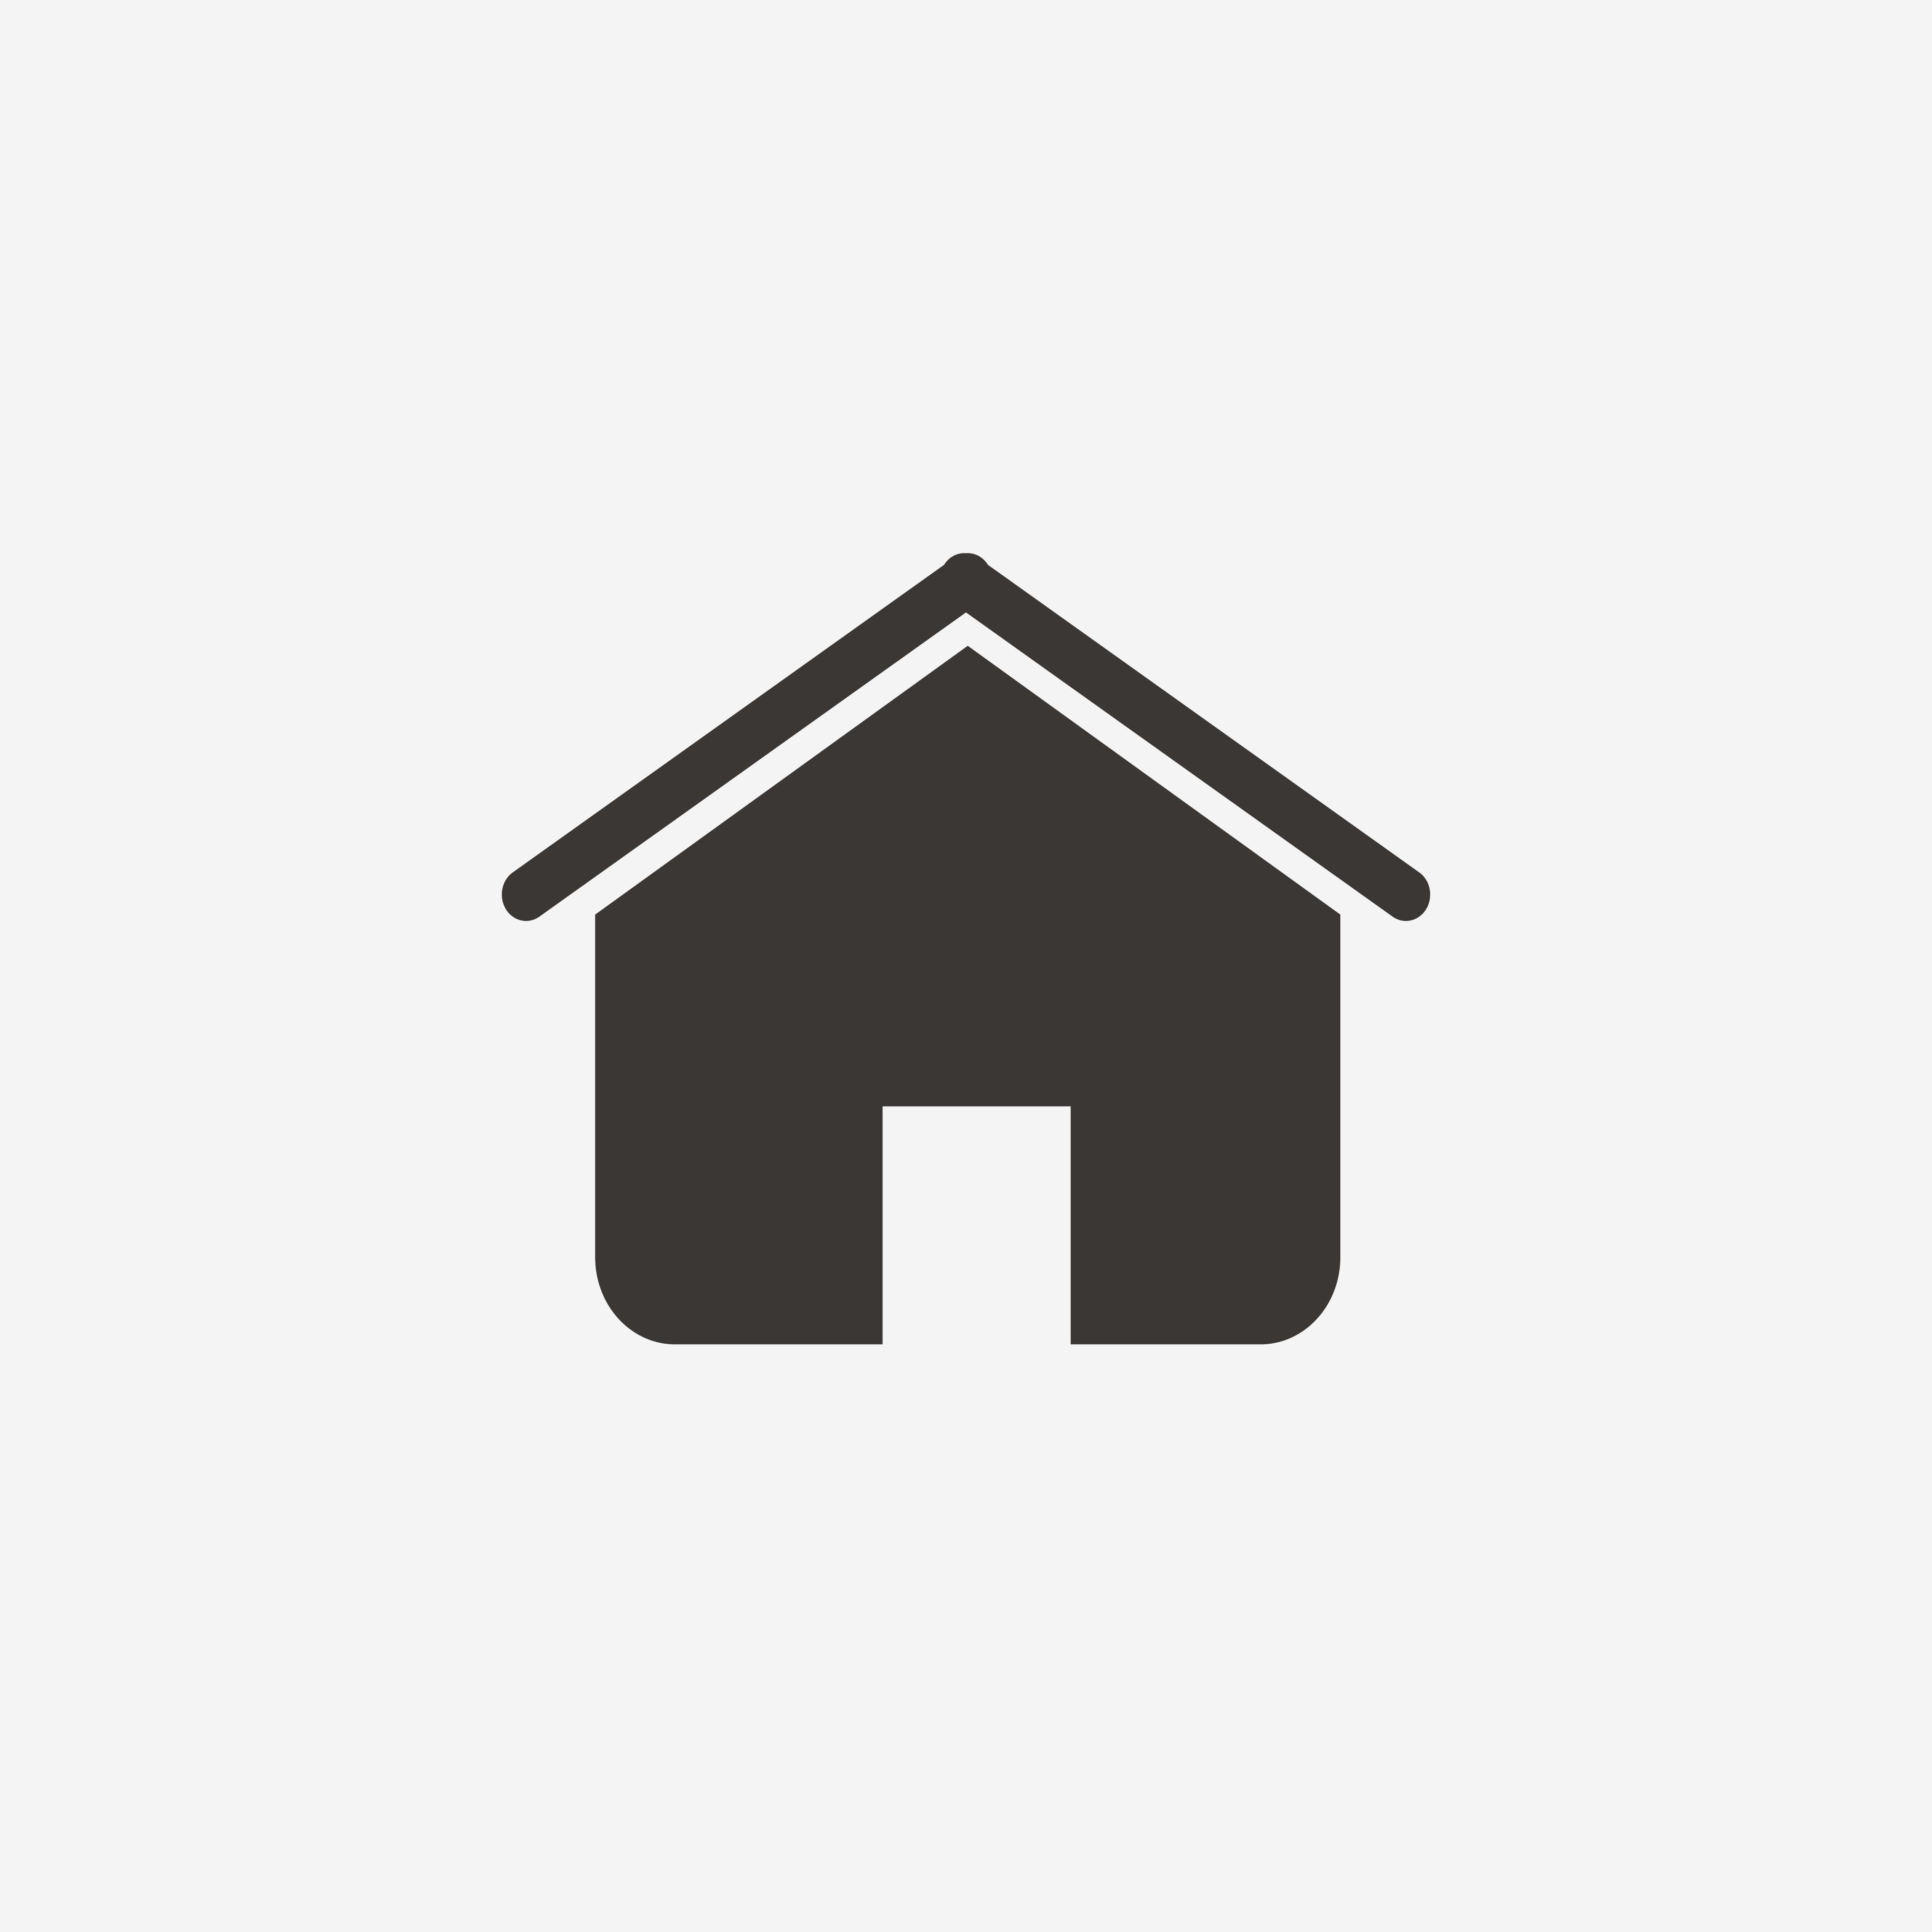 house_symbol